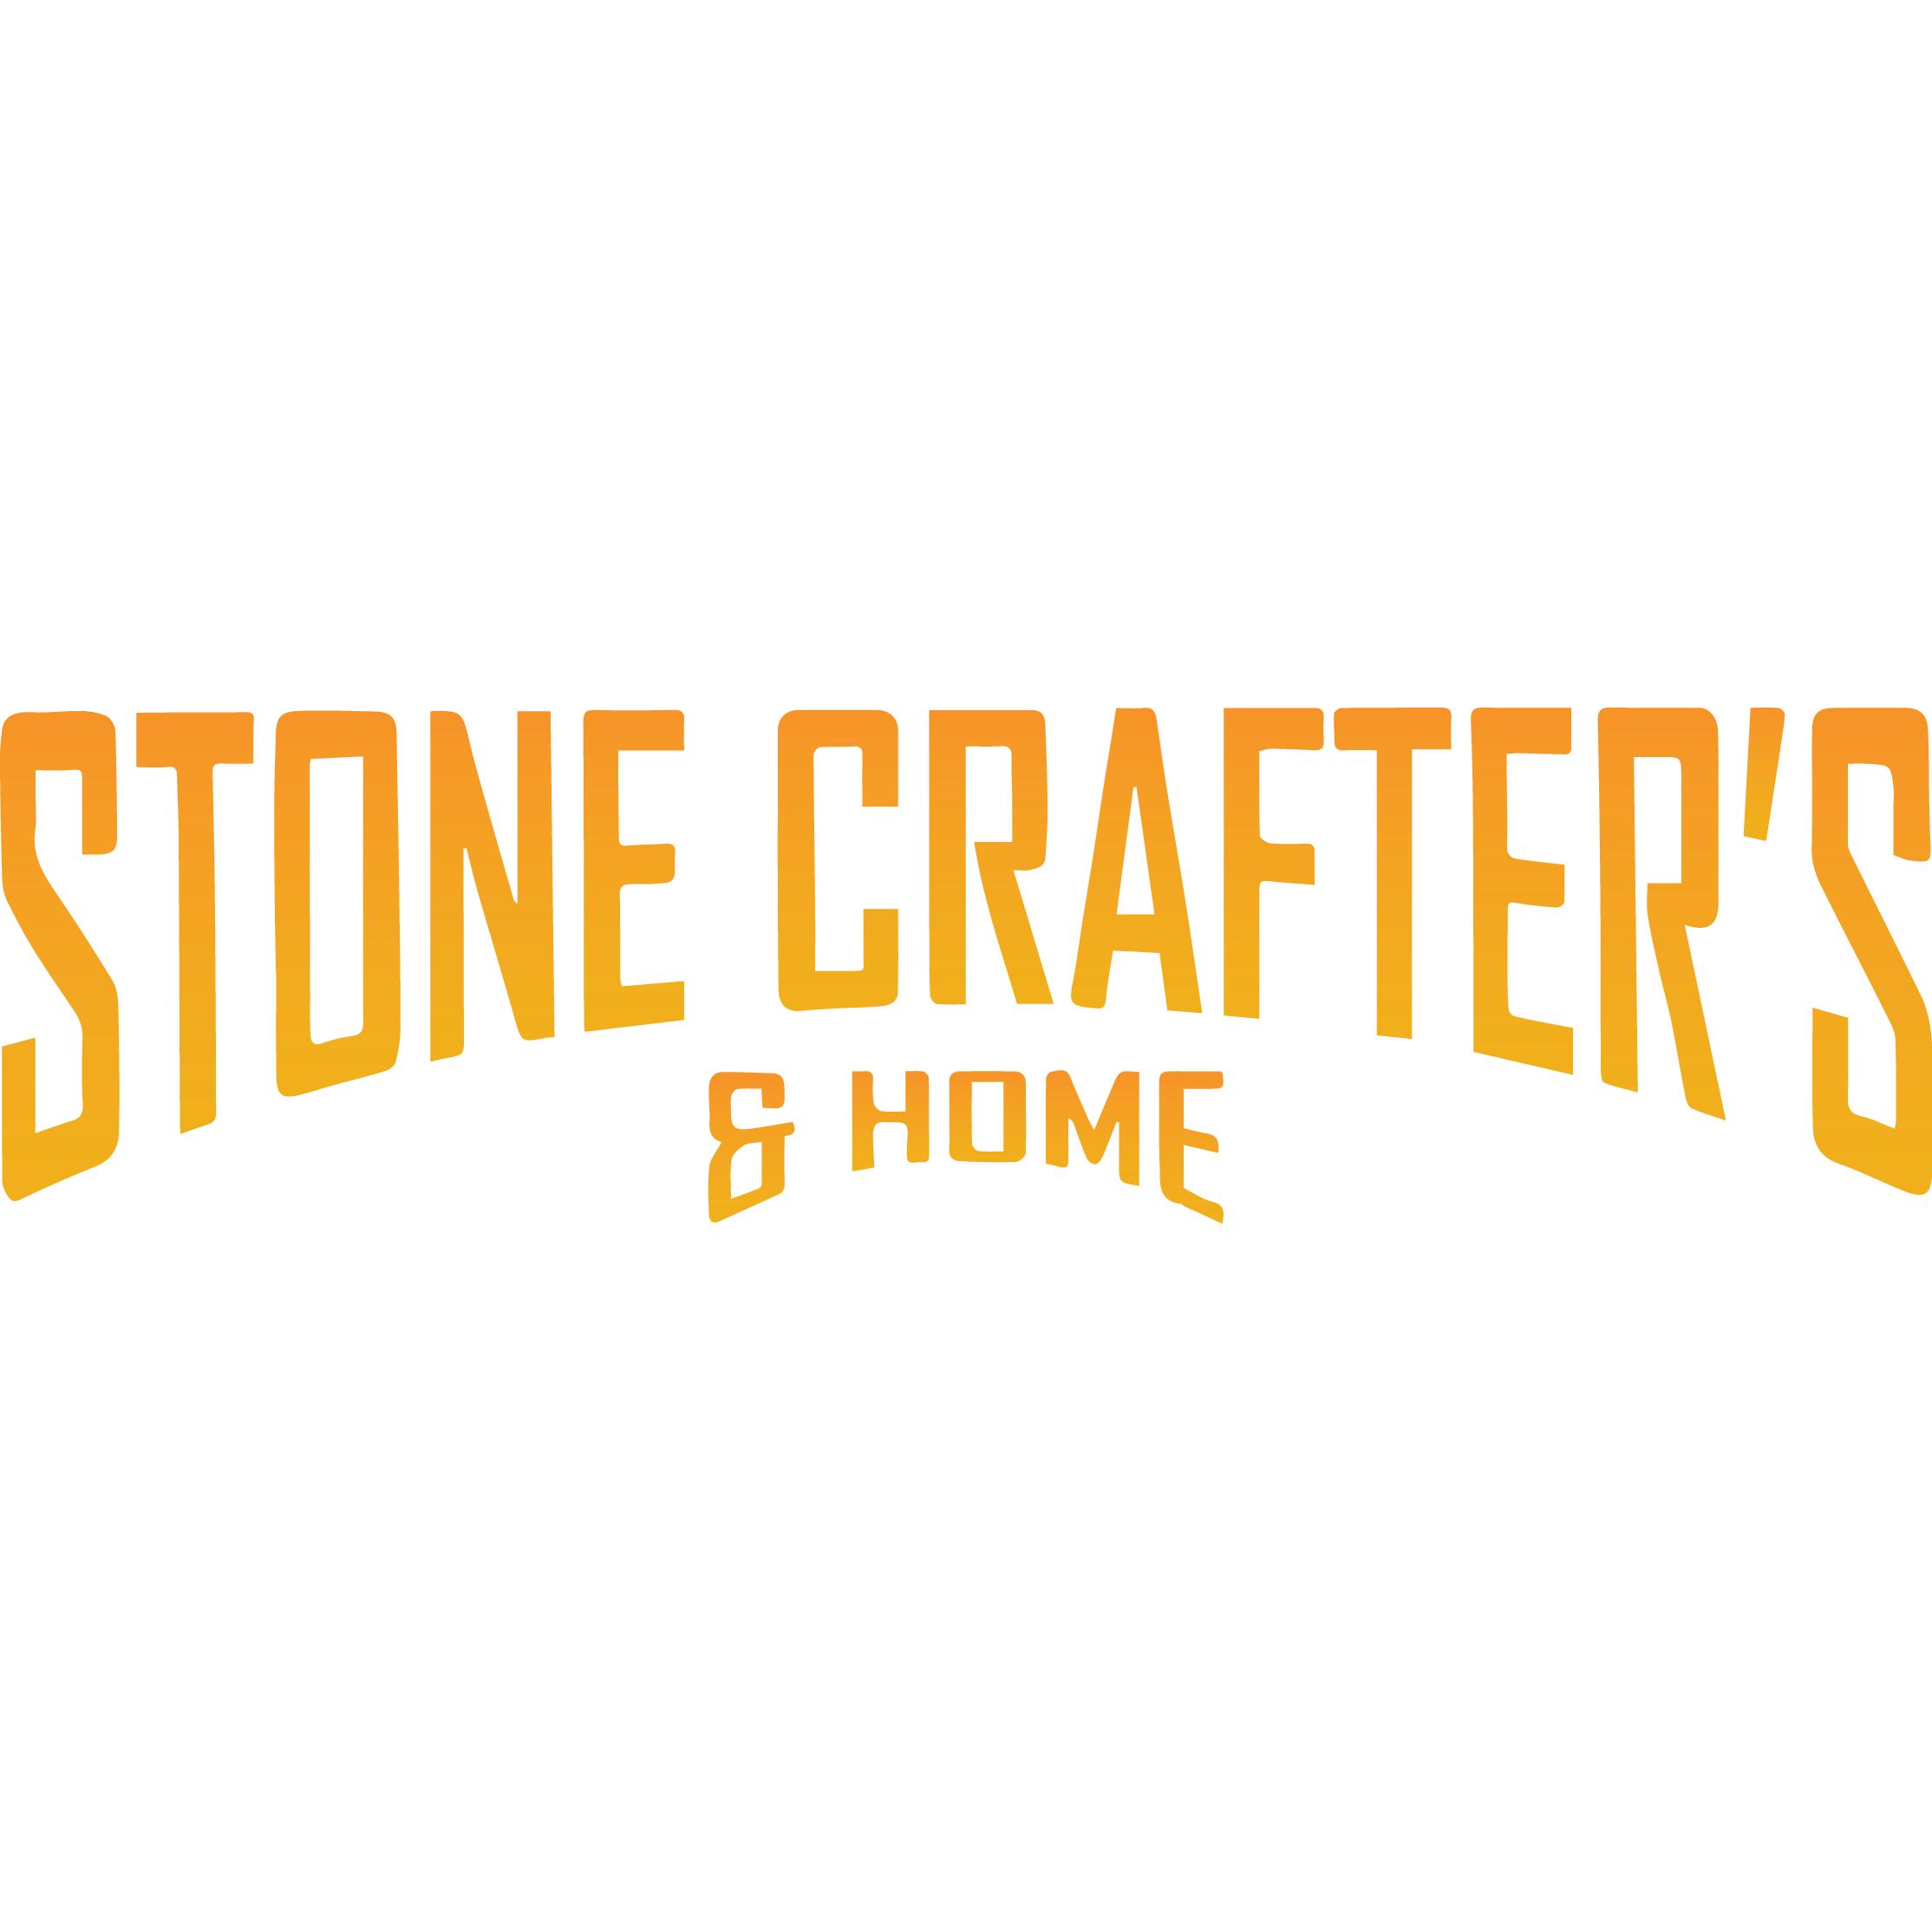 Stone Crafters - Modesto, CA 95351 - (209)810-2222 | ShowMeLocal.com